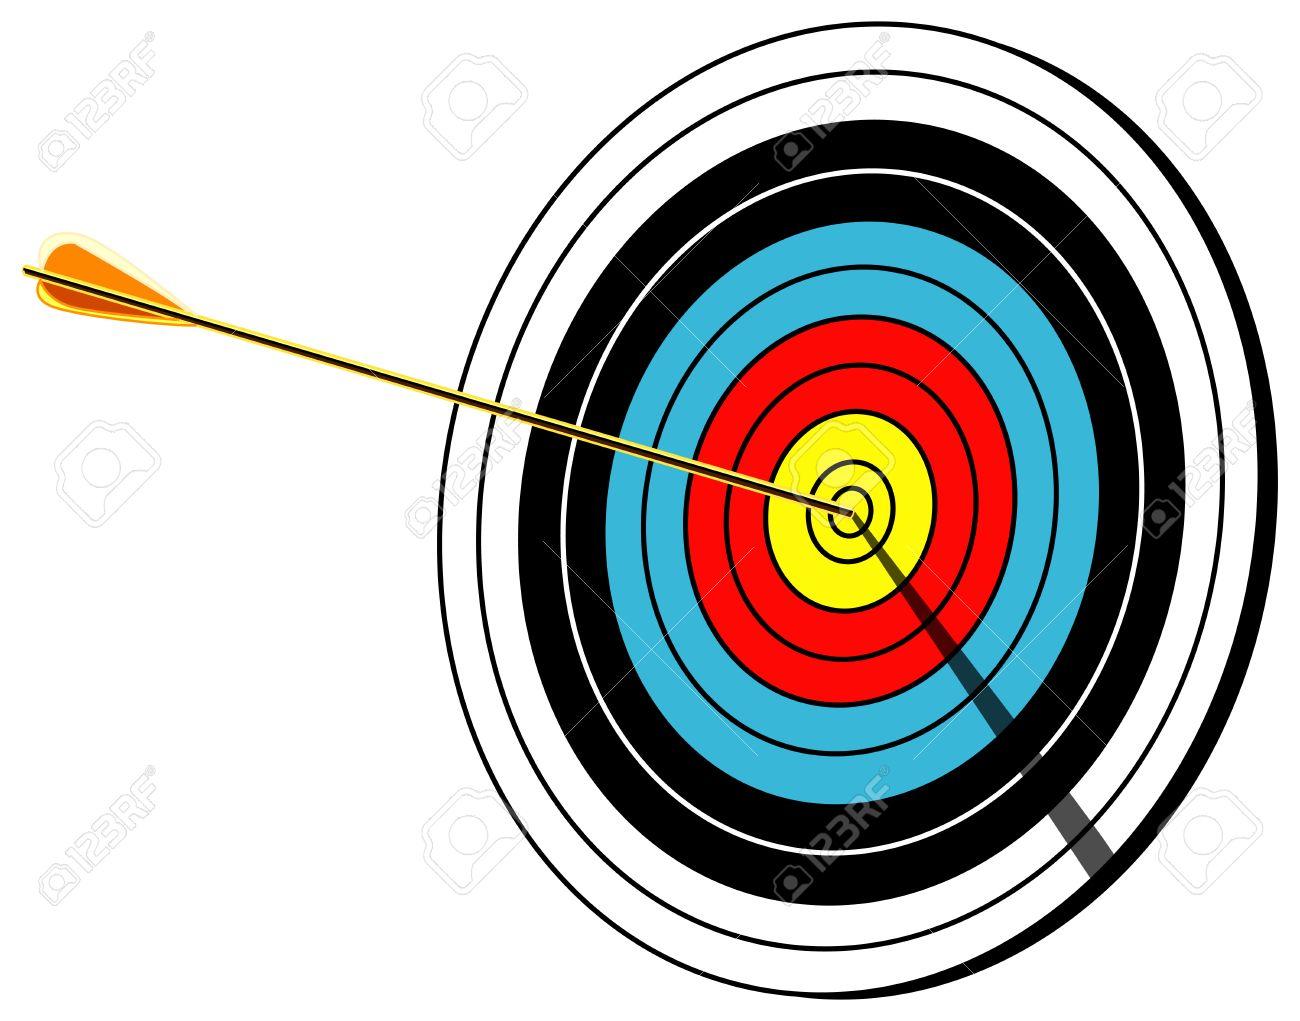 Archery Target With Arrow In Center Bullseye Shot Isolated